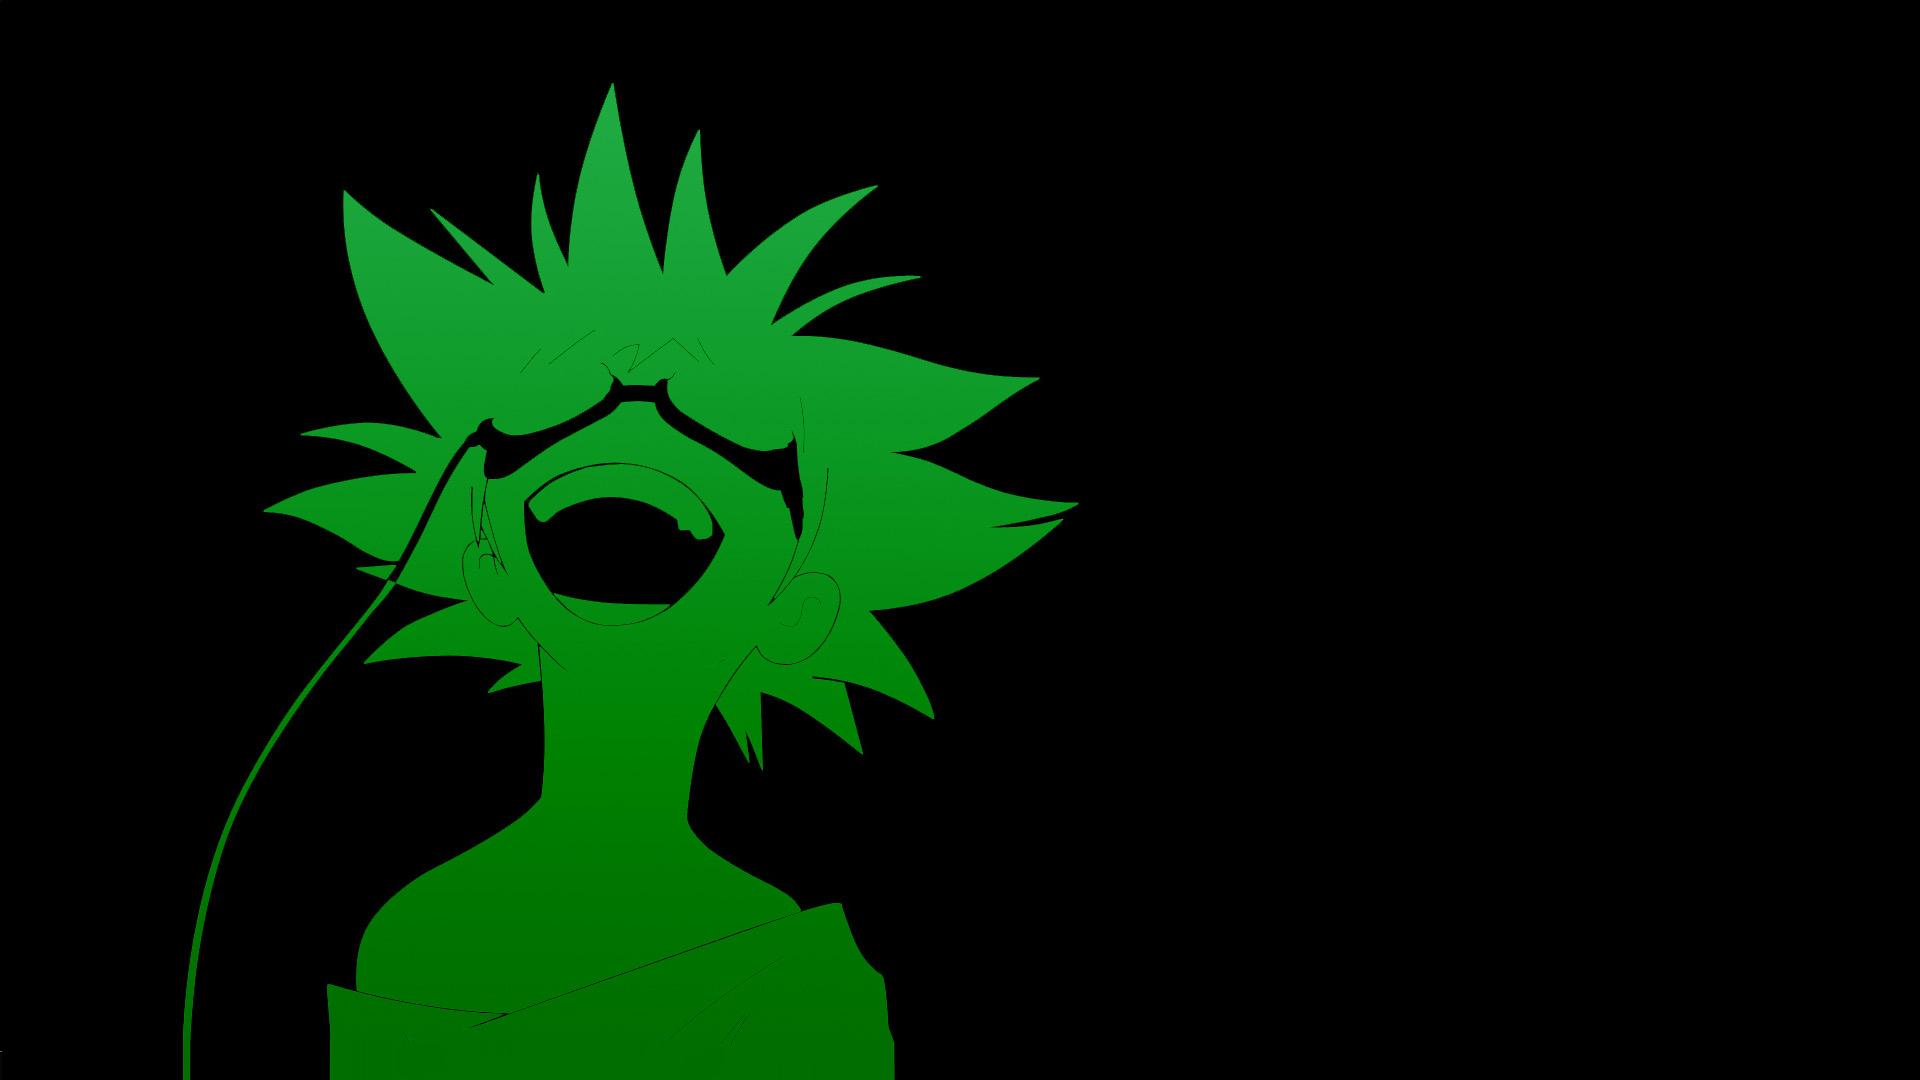 Cowboy Bebop anime green black background anime boys